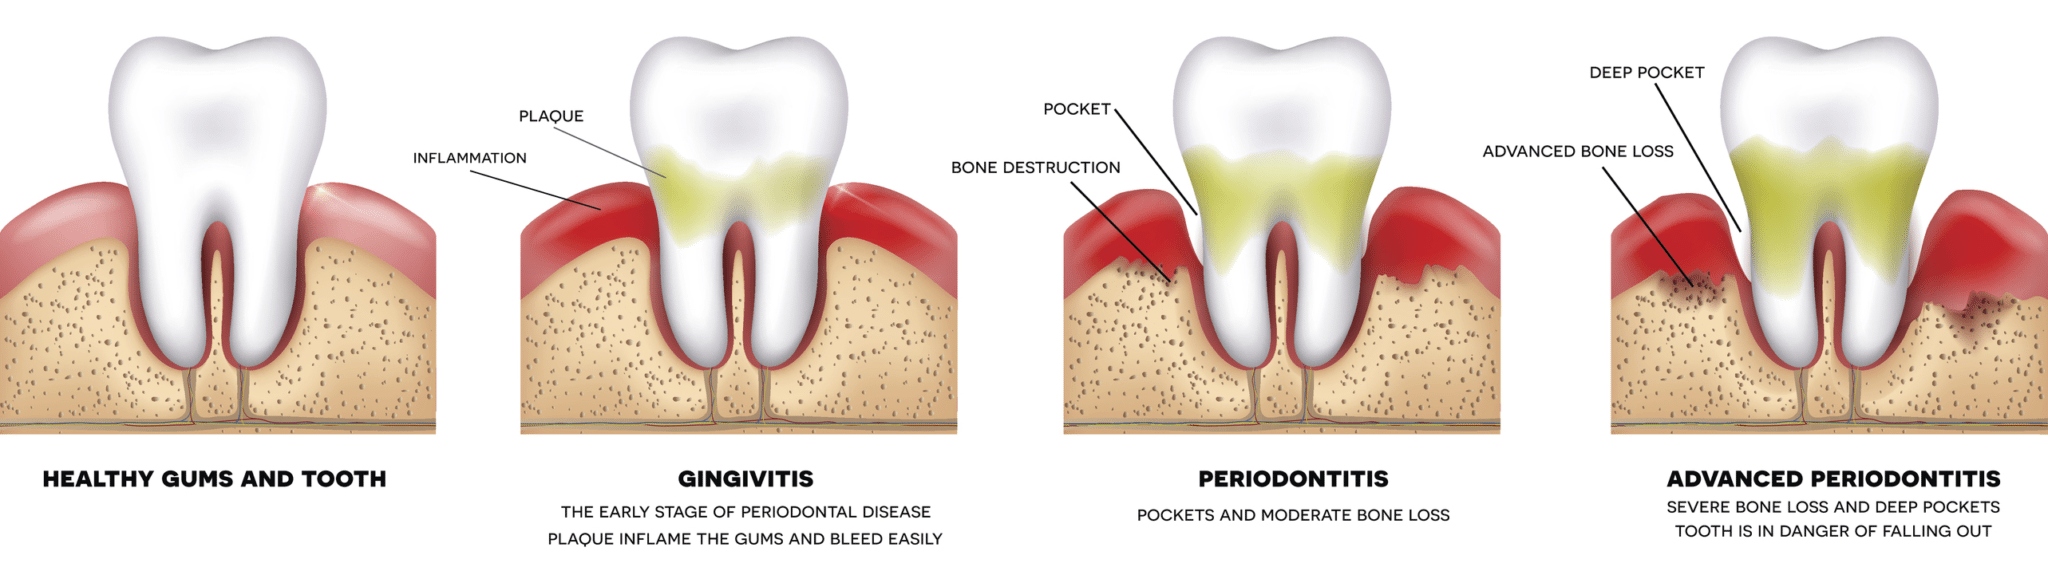 Periodontal treatment in Seminole County Florida